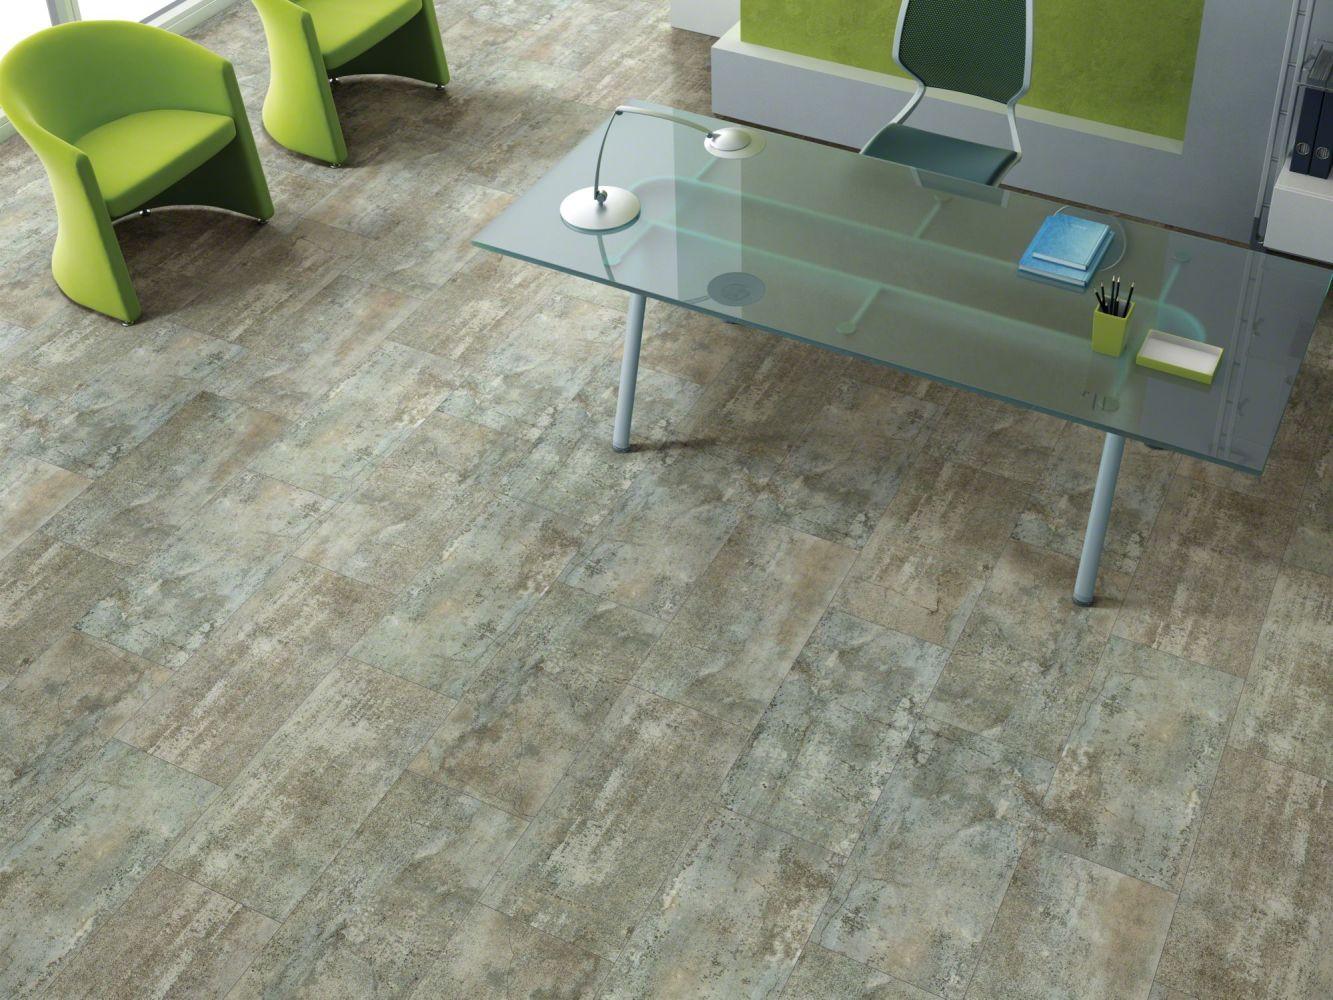 Shaw Floors Vinyl Home Foundations Turninstone 720c Plus Slab 00583_521RG